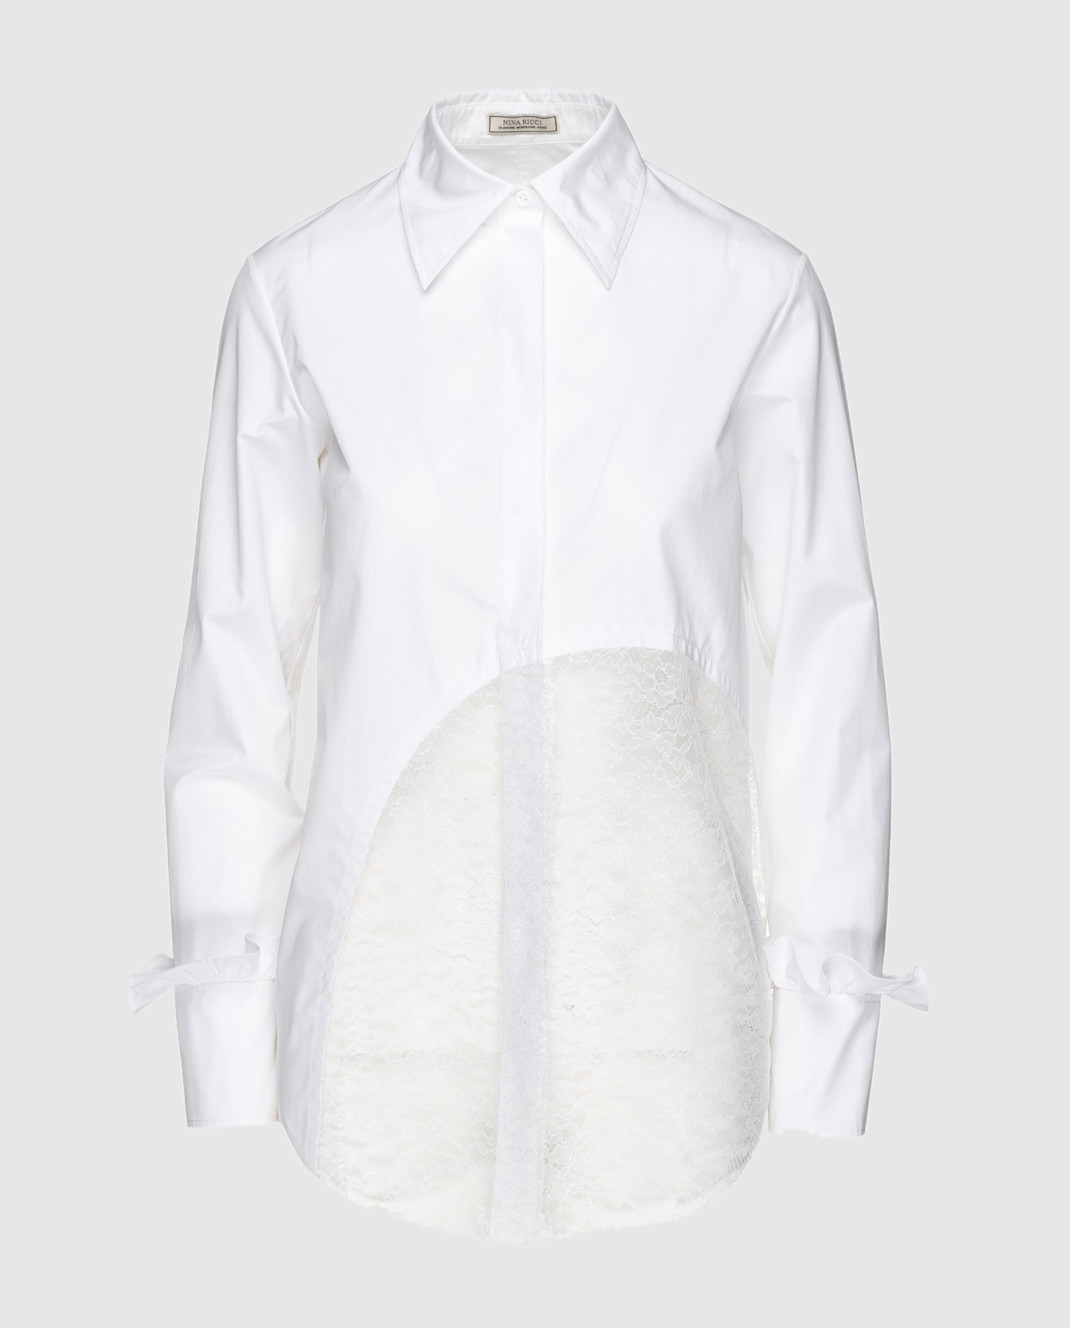 NINA RICCI Белая рубашка с кружевом 17ACT0027C00844